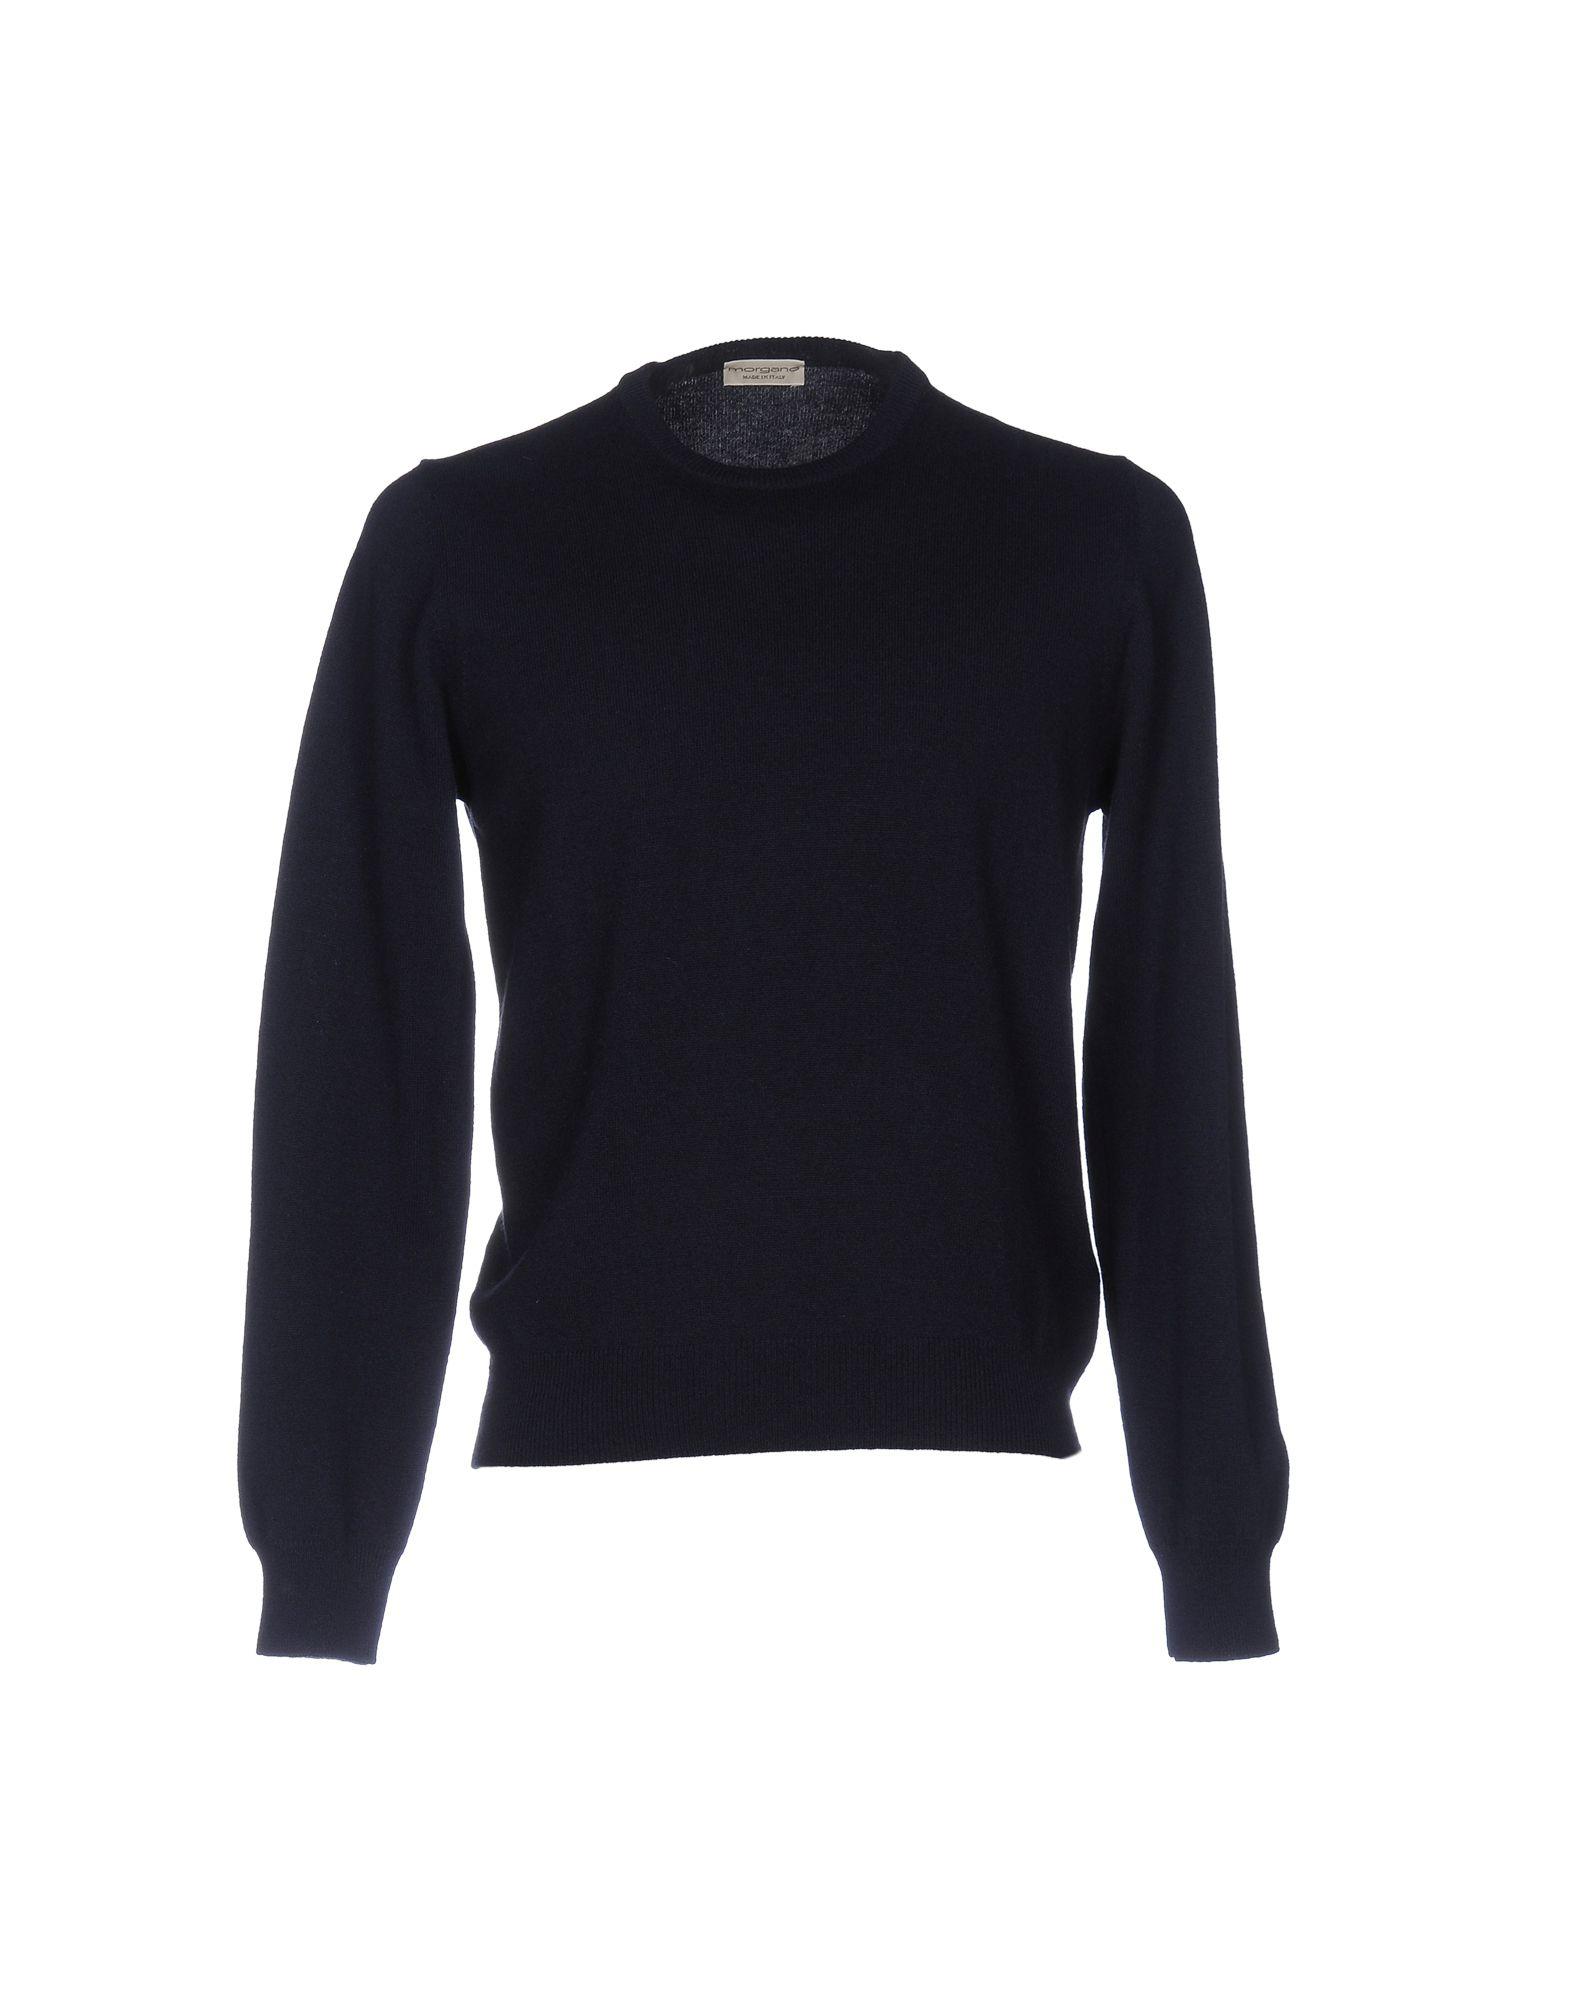 MORGANO Sweater in Dark Blue